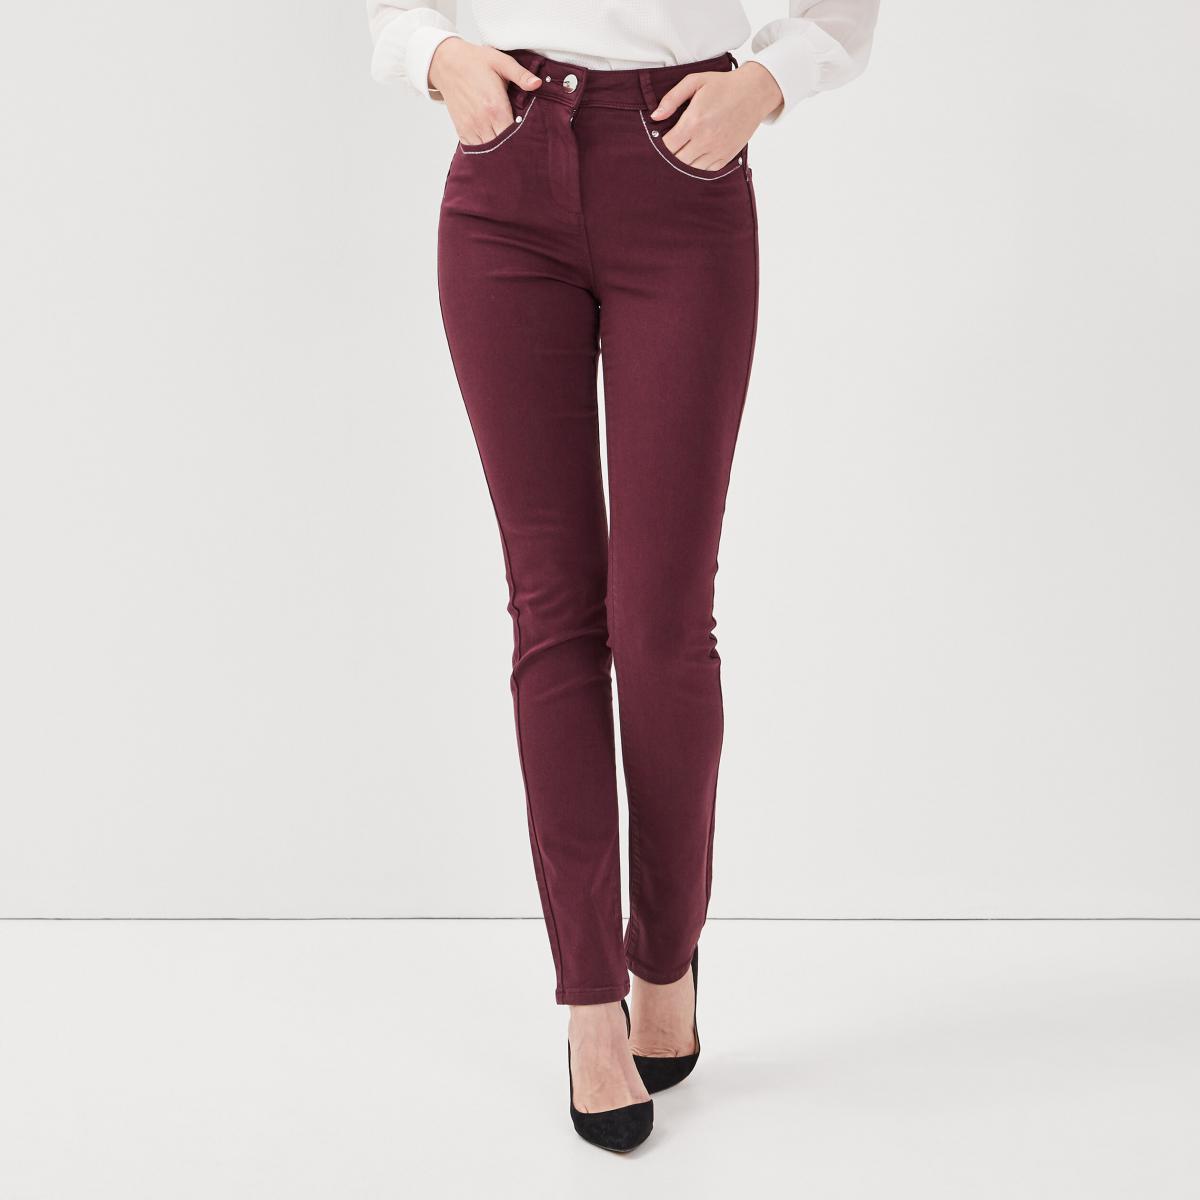 Pantalon ajusté taille haute - 3 suisses - Modalova